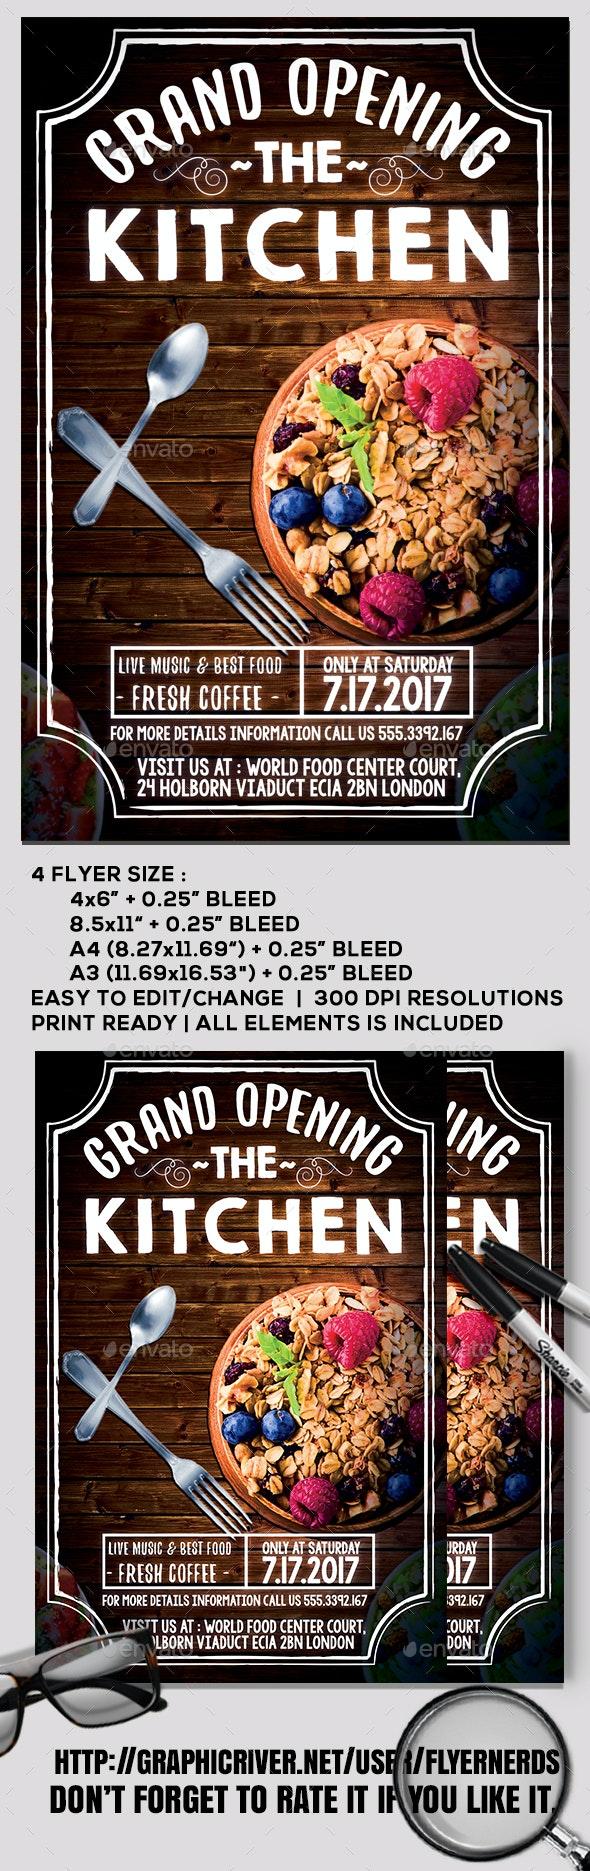 Restaurant Grand Opening Flyer - Restaurant Flyers